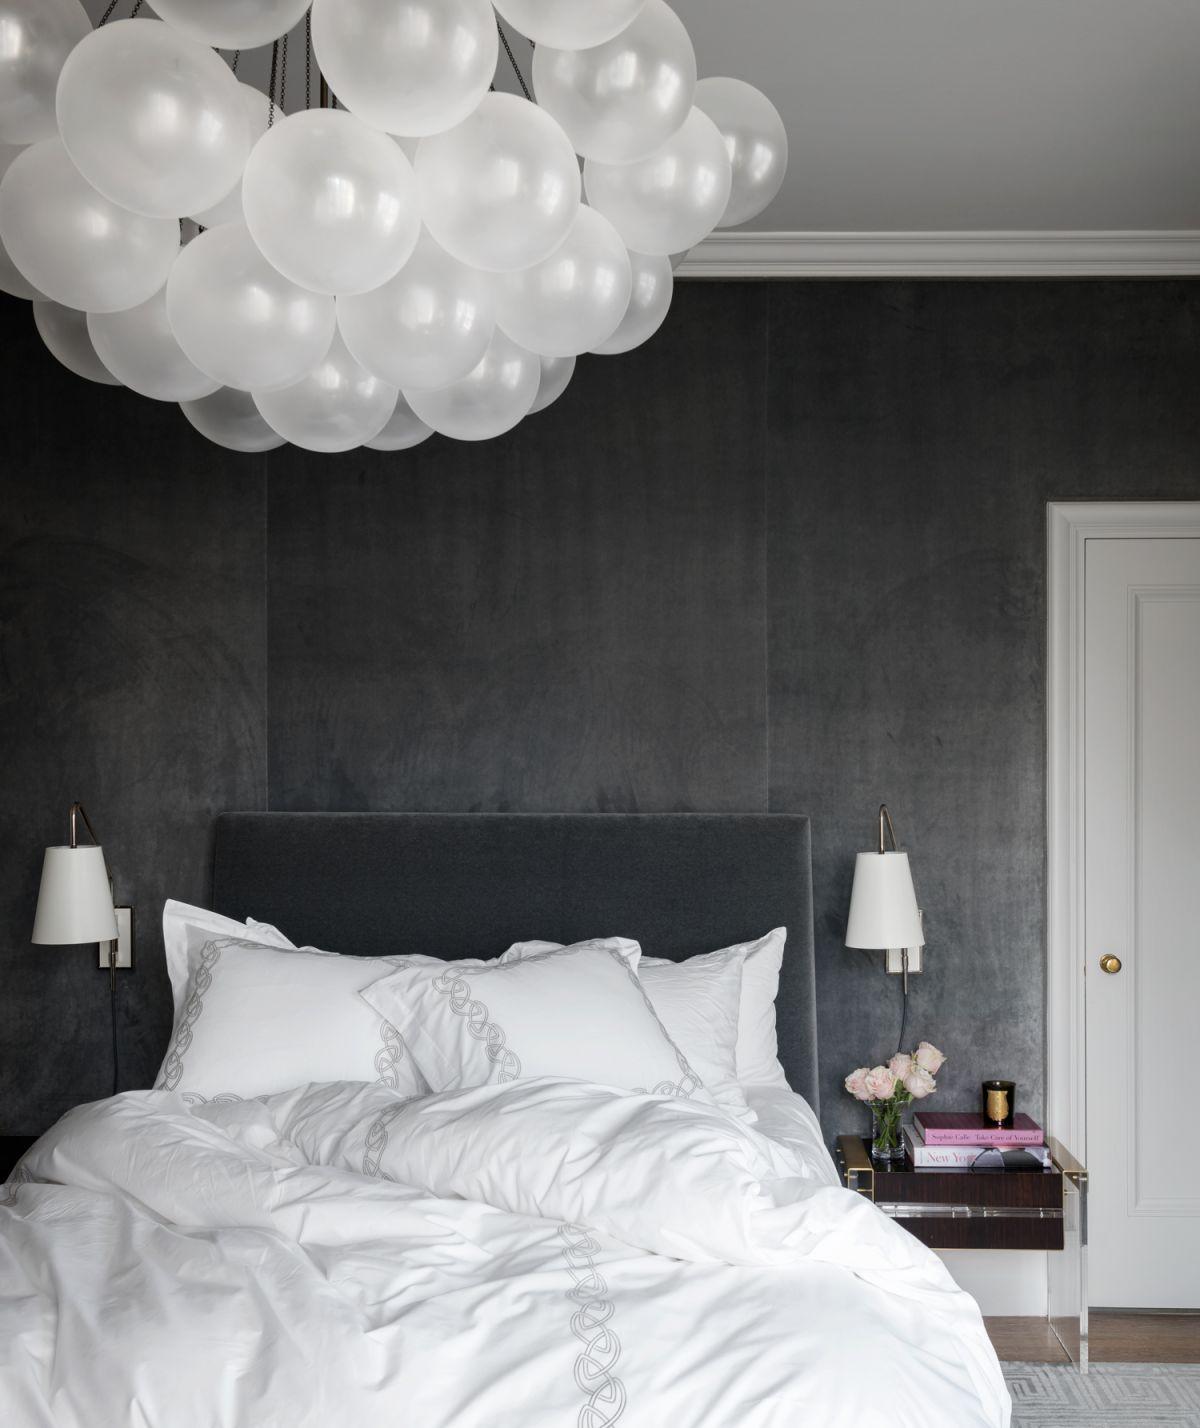 Dark Bedroom Ideas Moody Dark And Stormy Hues For Modern Bedrooms Livingetc Livingetcdocument Documenttype